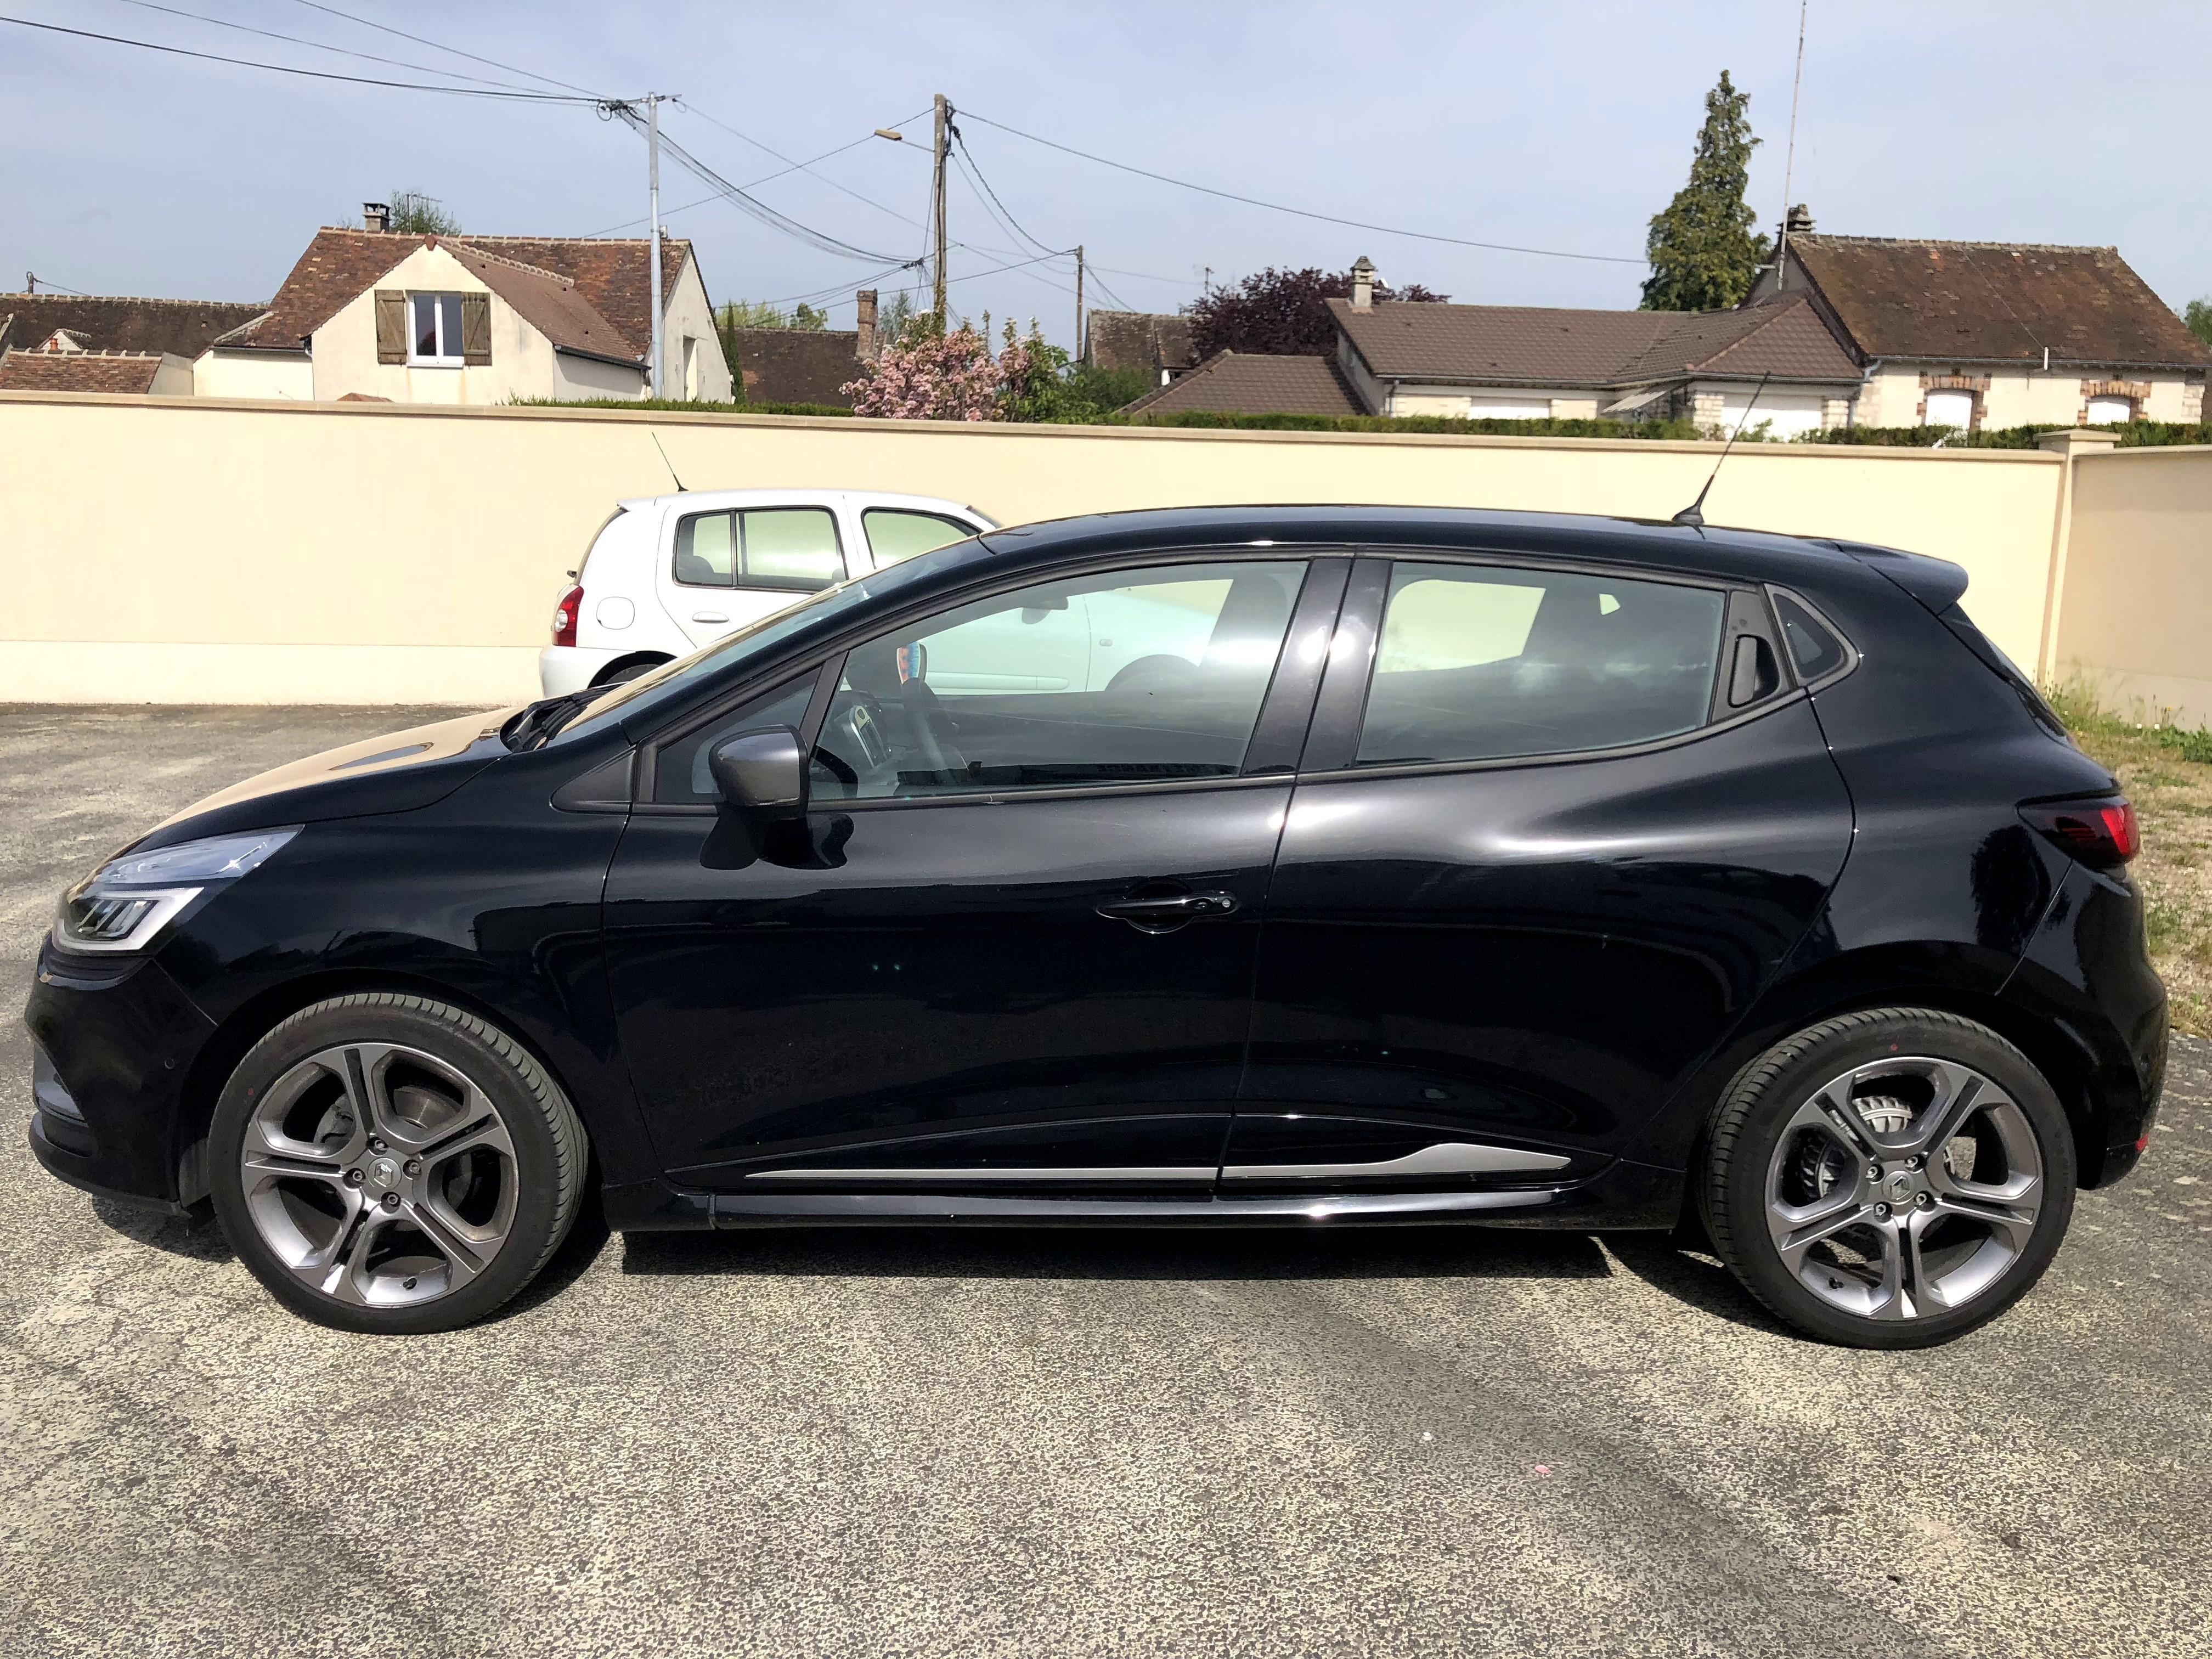 Renault Clio IV Nouvelle Essence Manuelle 2016 Chilly-Mazarin